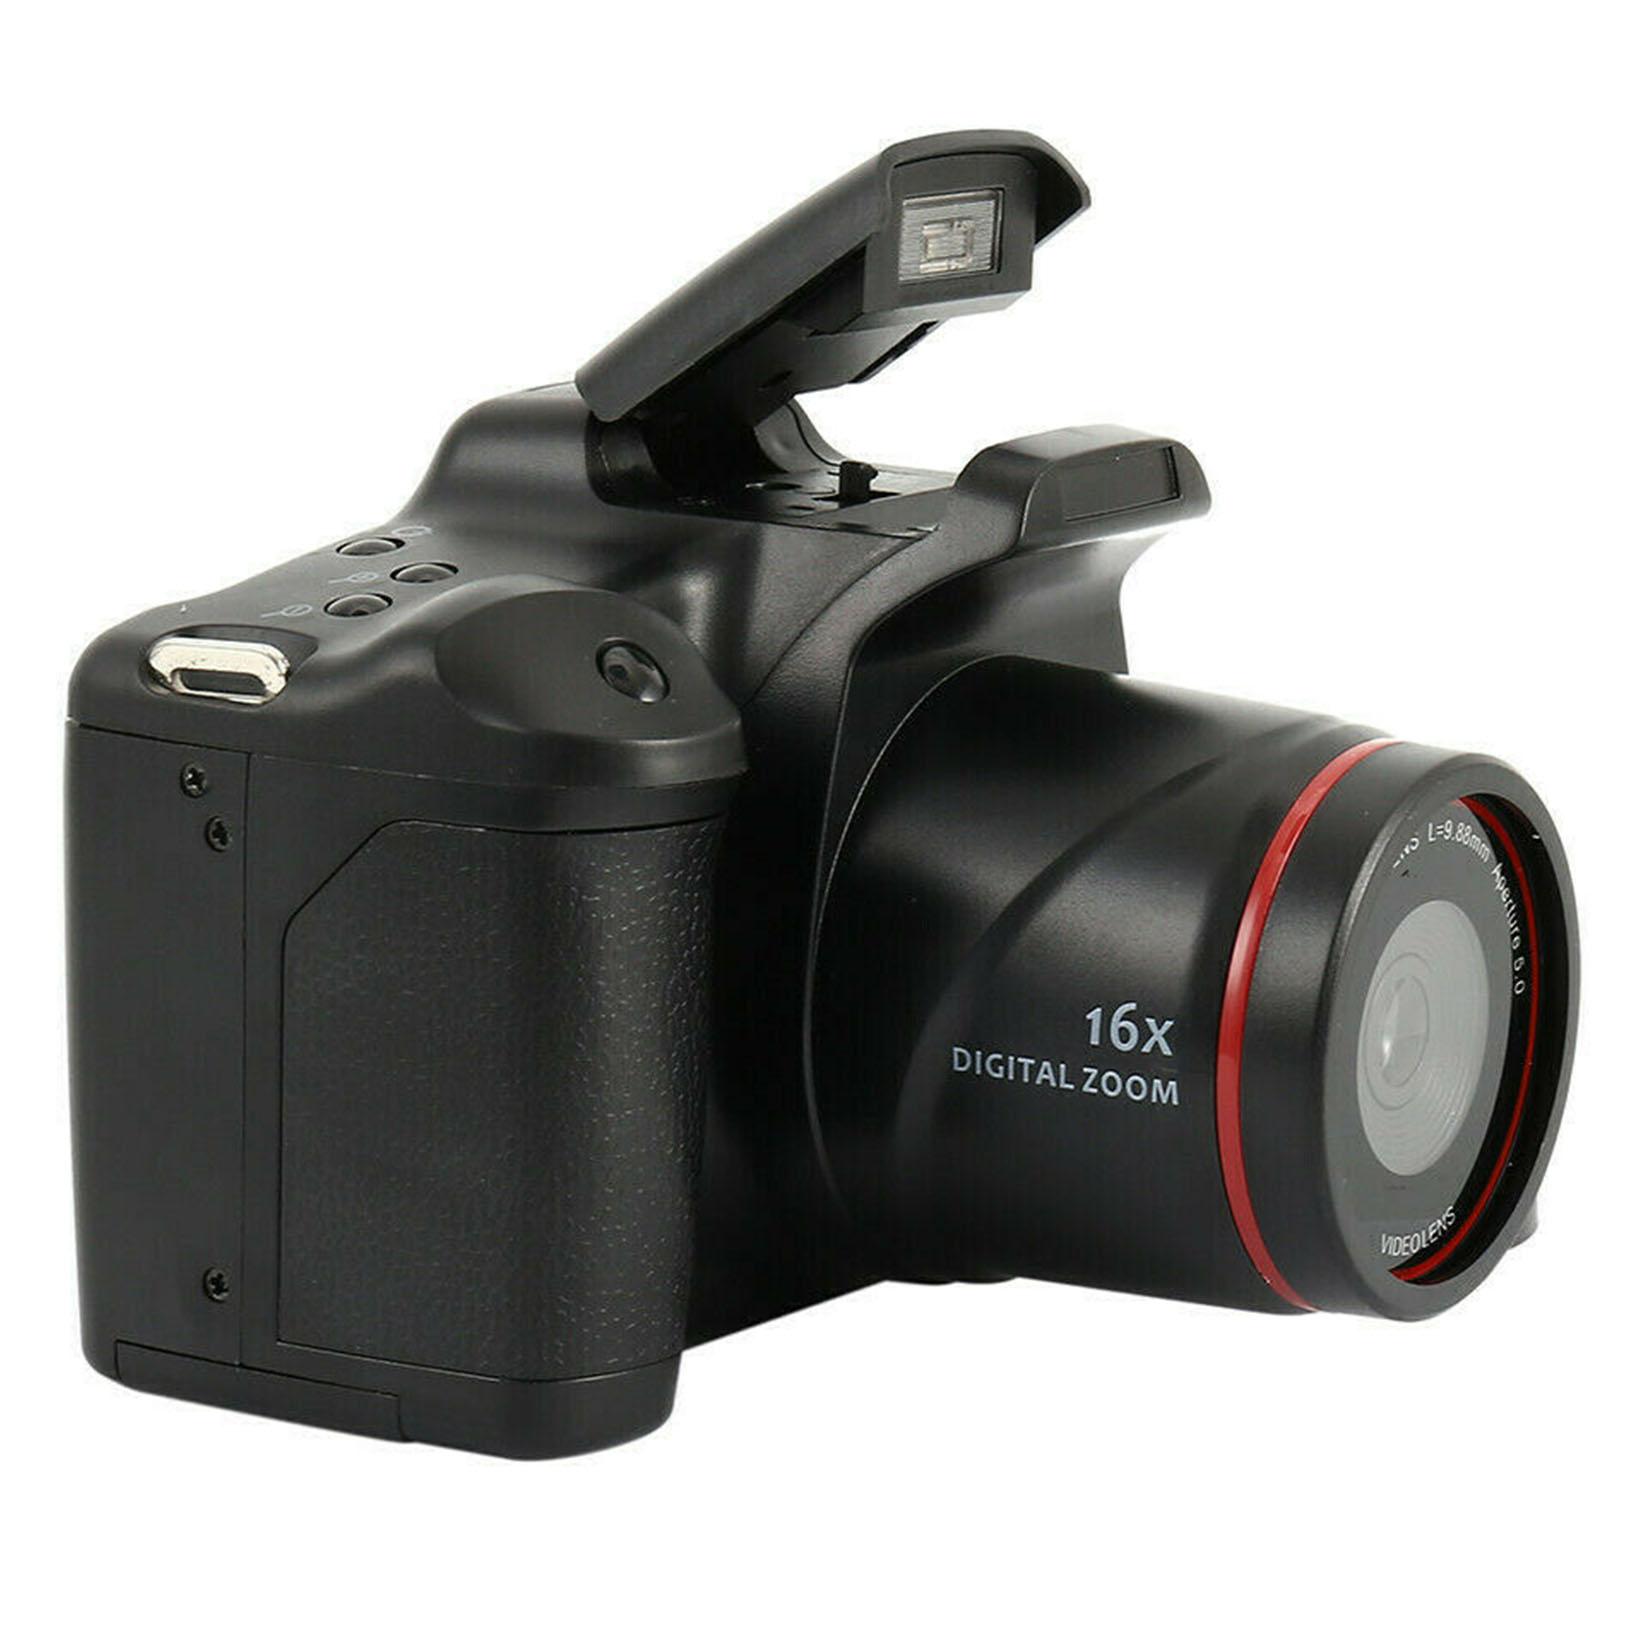 1PC Digital Camera 3.0 Inch TFT LCD Screen 16X Zoom HD 16MP 1080P Anti-shake US